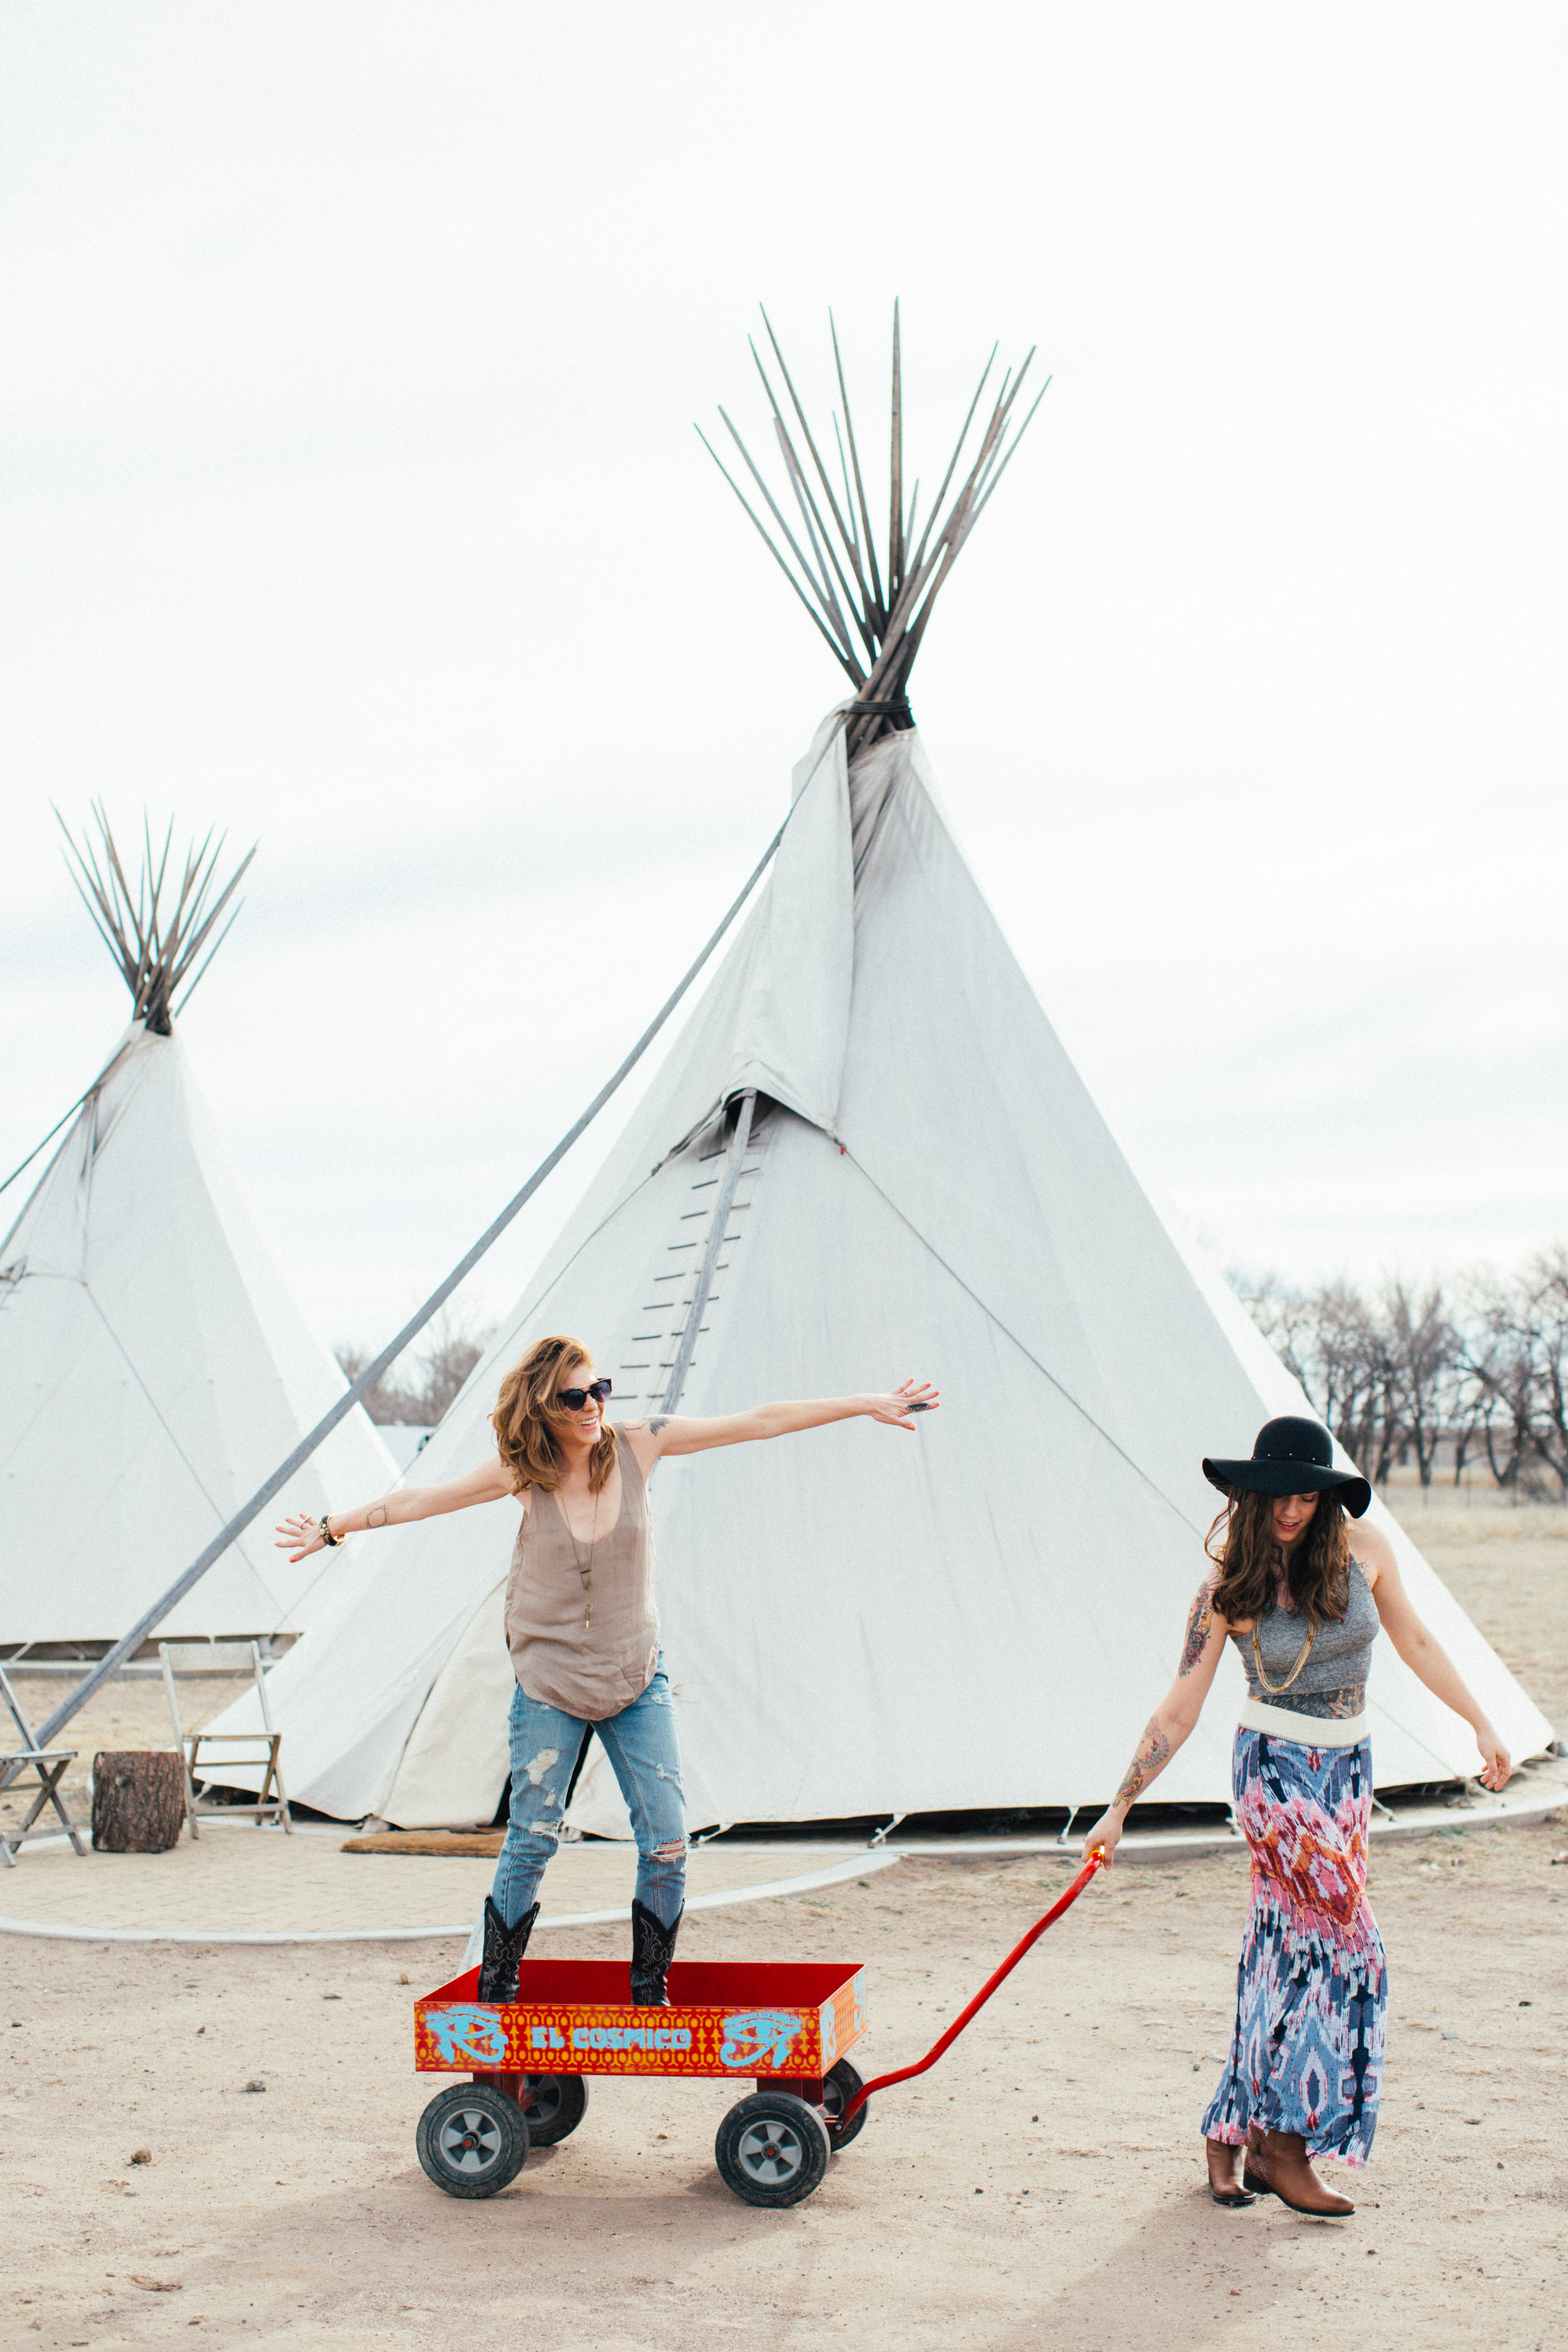 Marfa Texas Day 1 Chloe and Ashley 2015-16.jpg